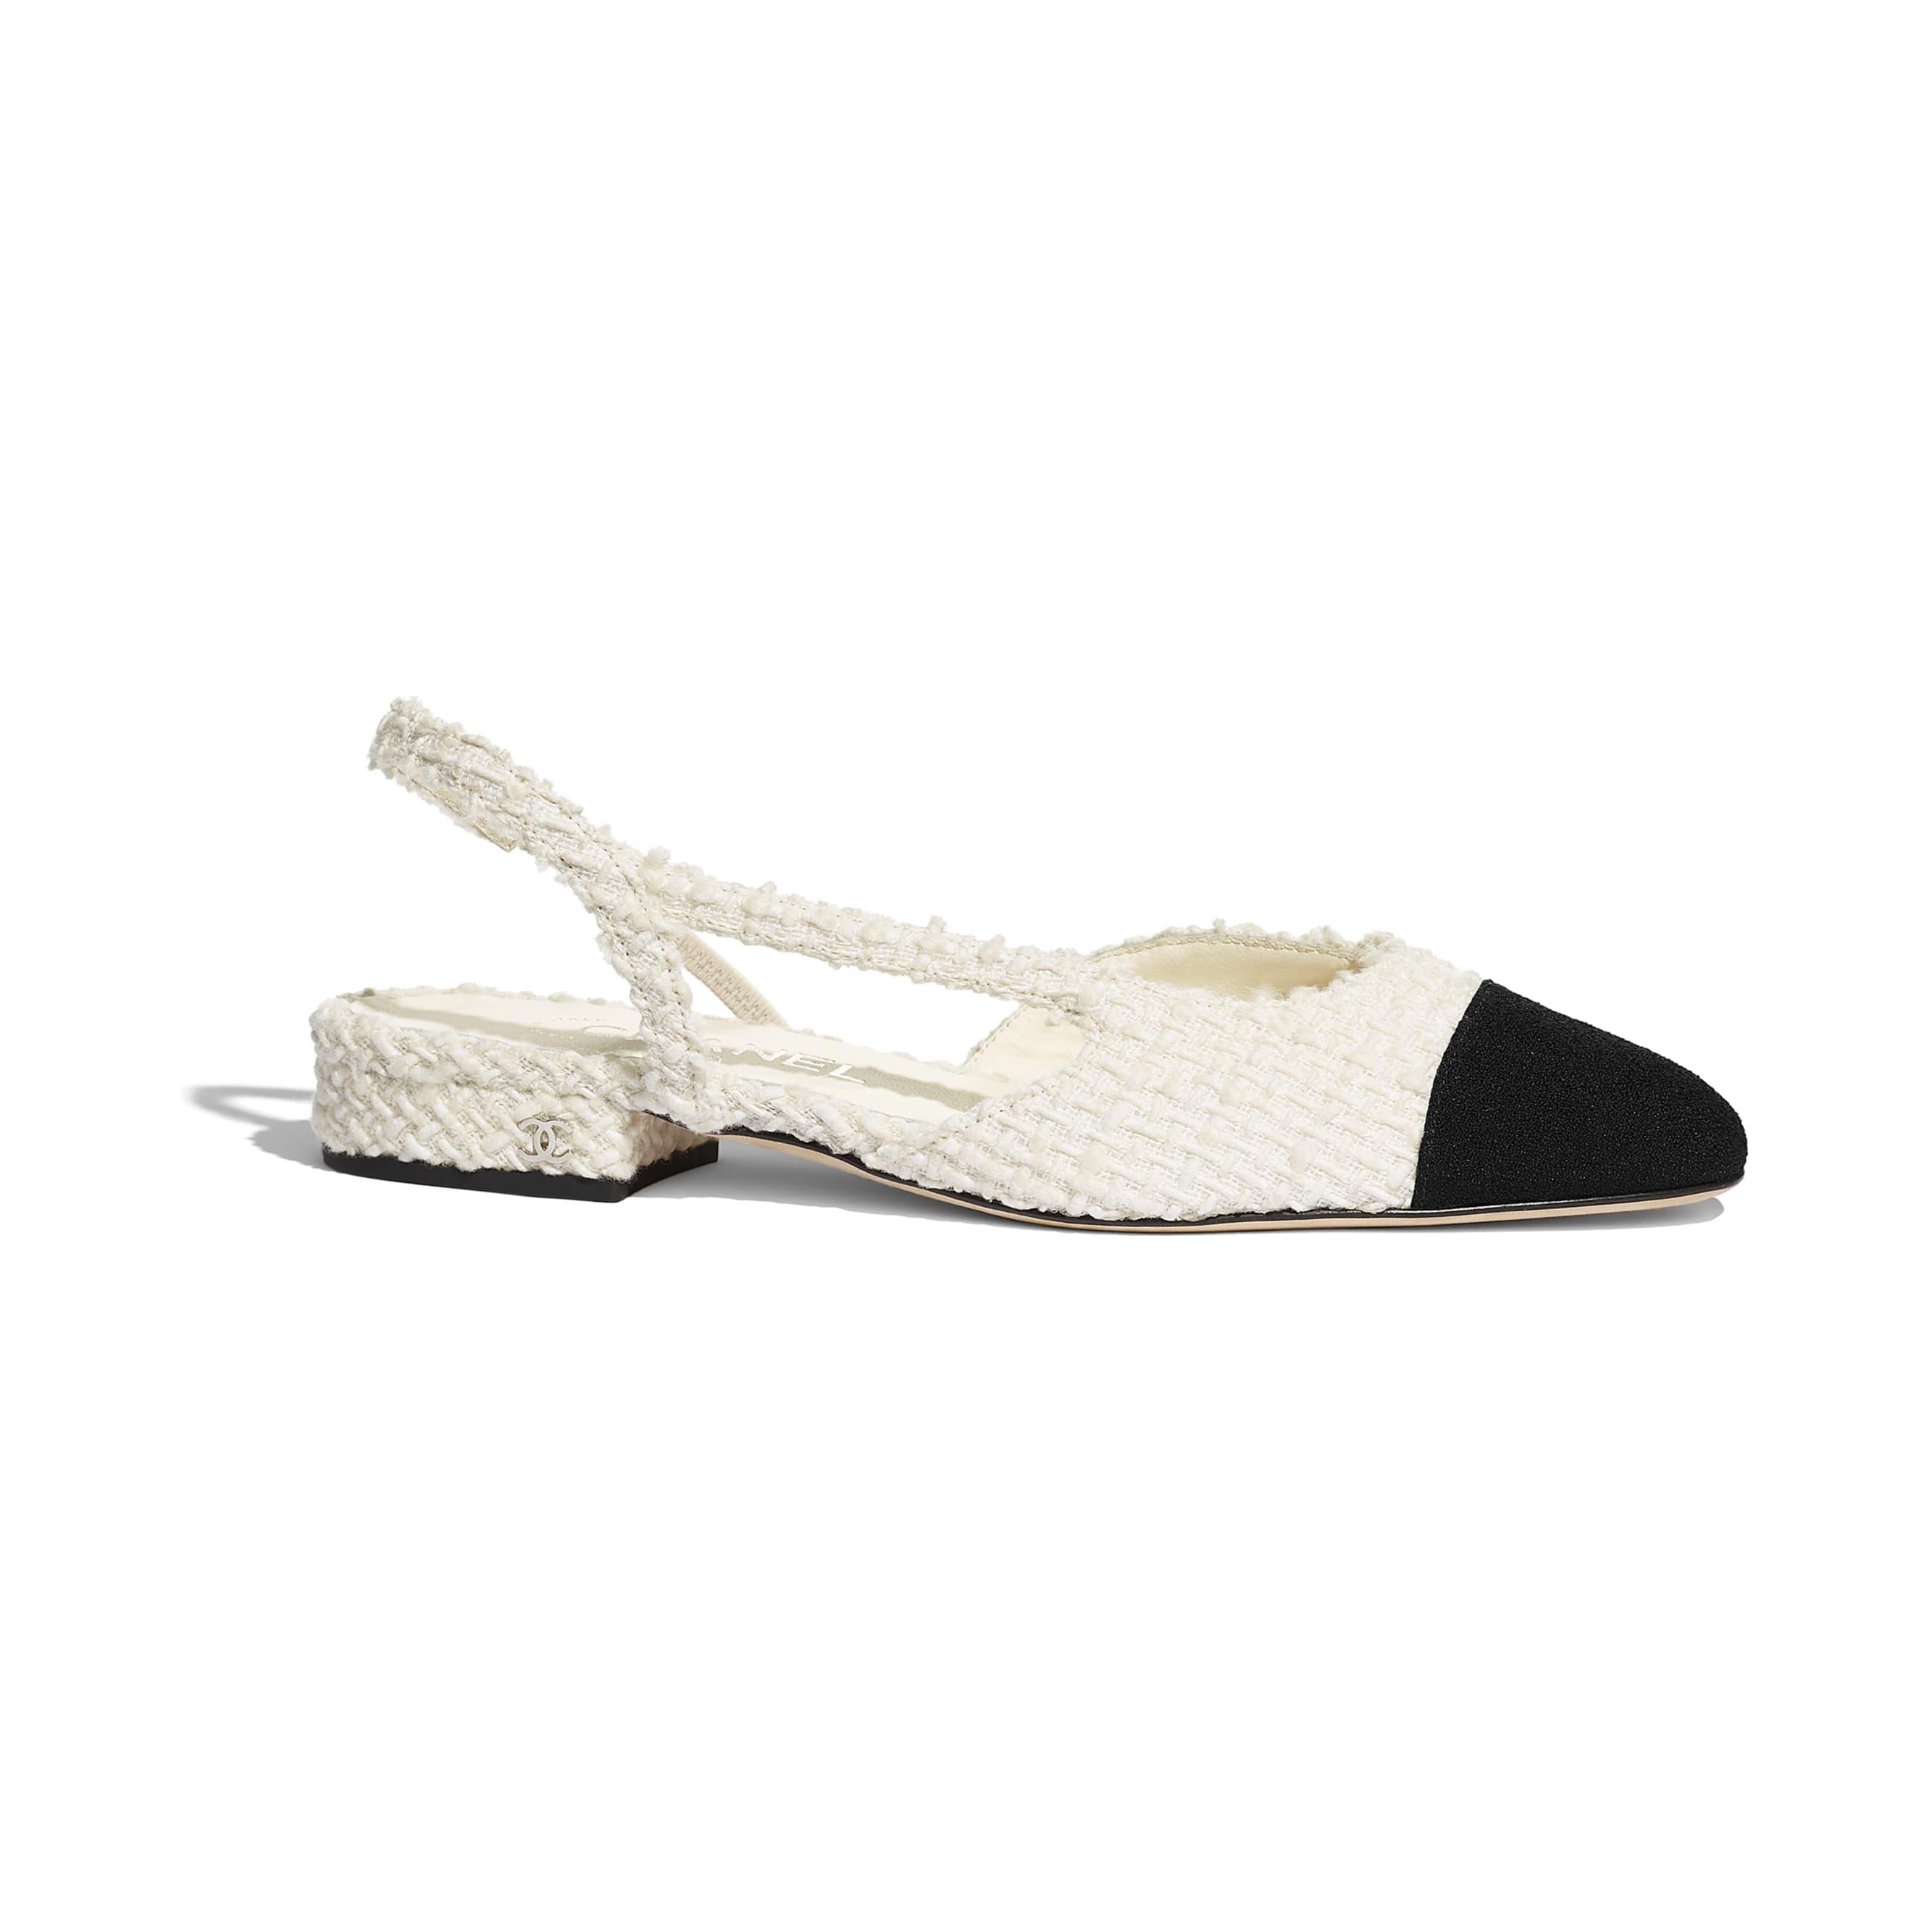 Slingbacks - White & Black - Wool Tweed - CHANEL - Default view - see standard sized version